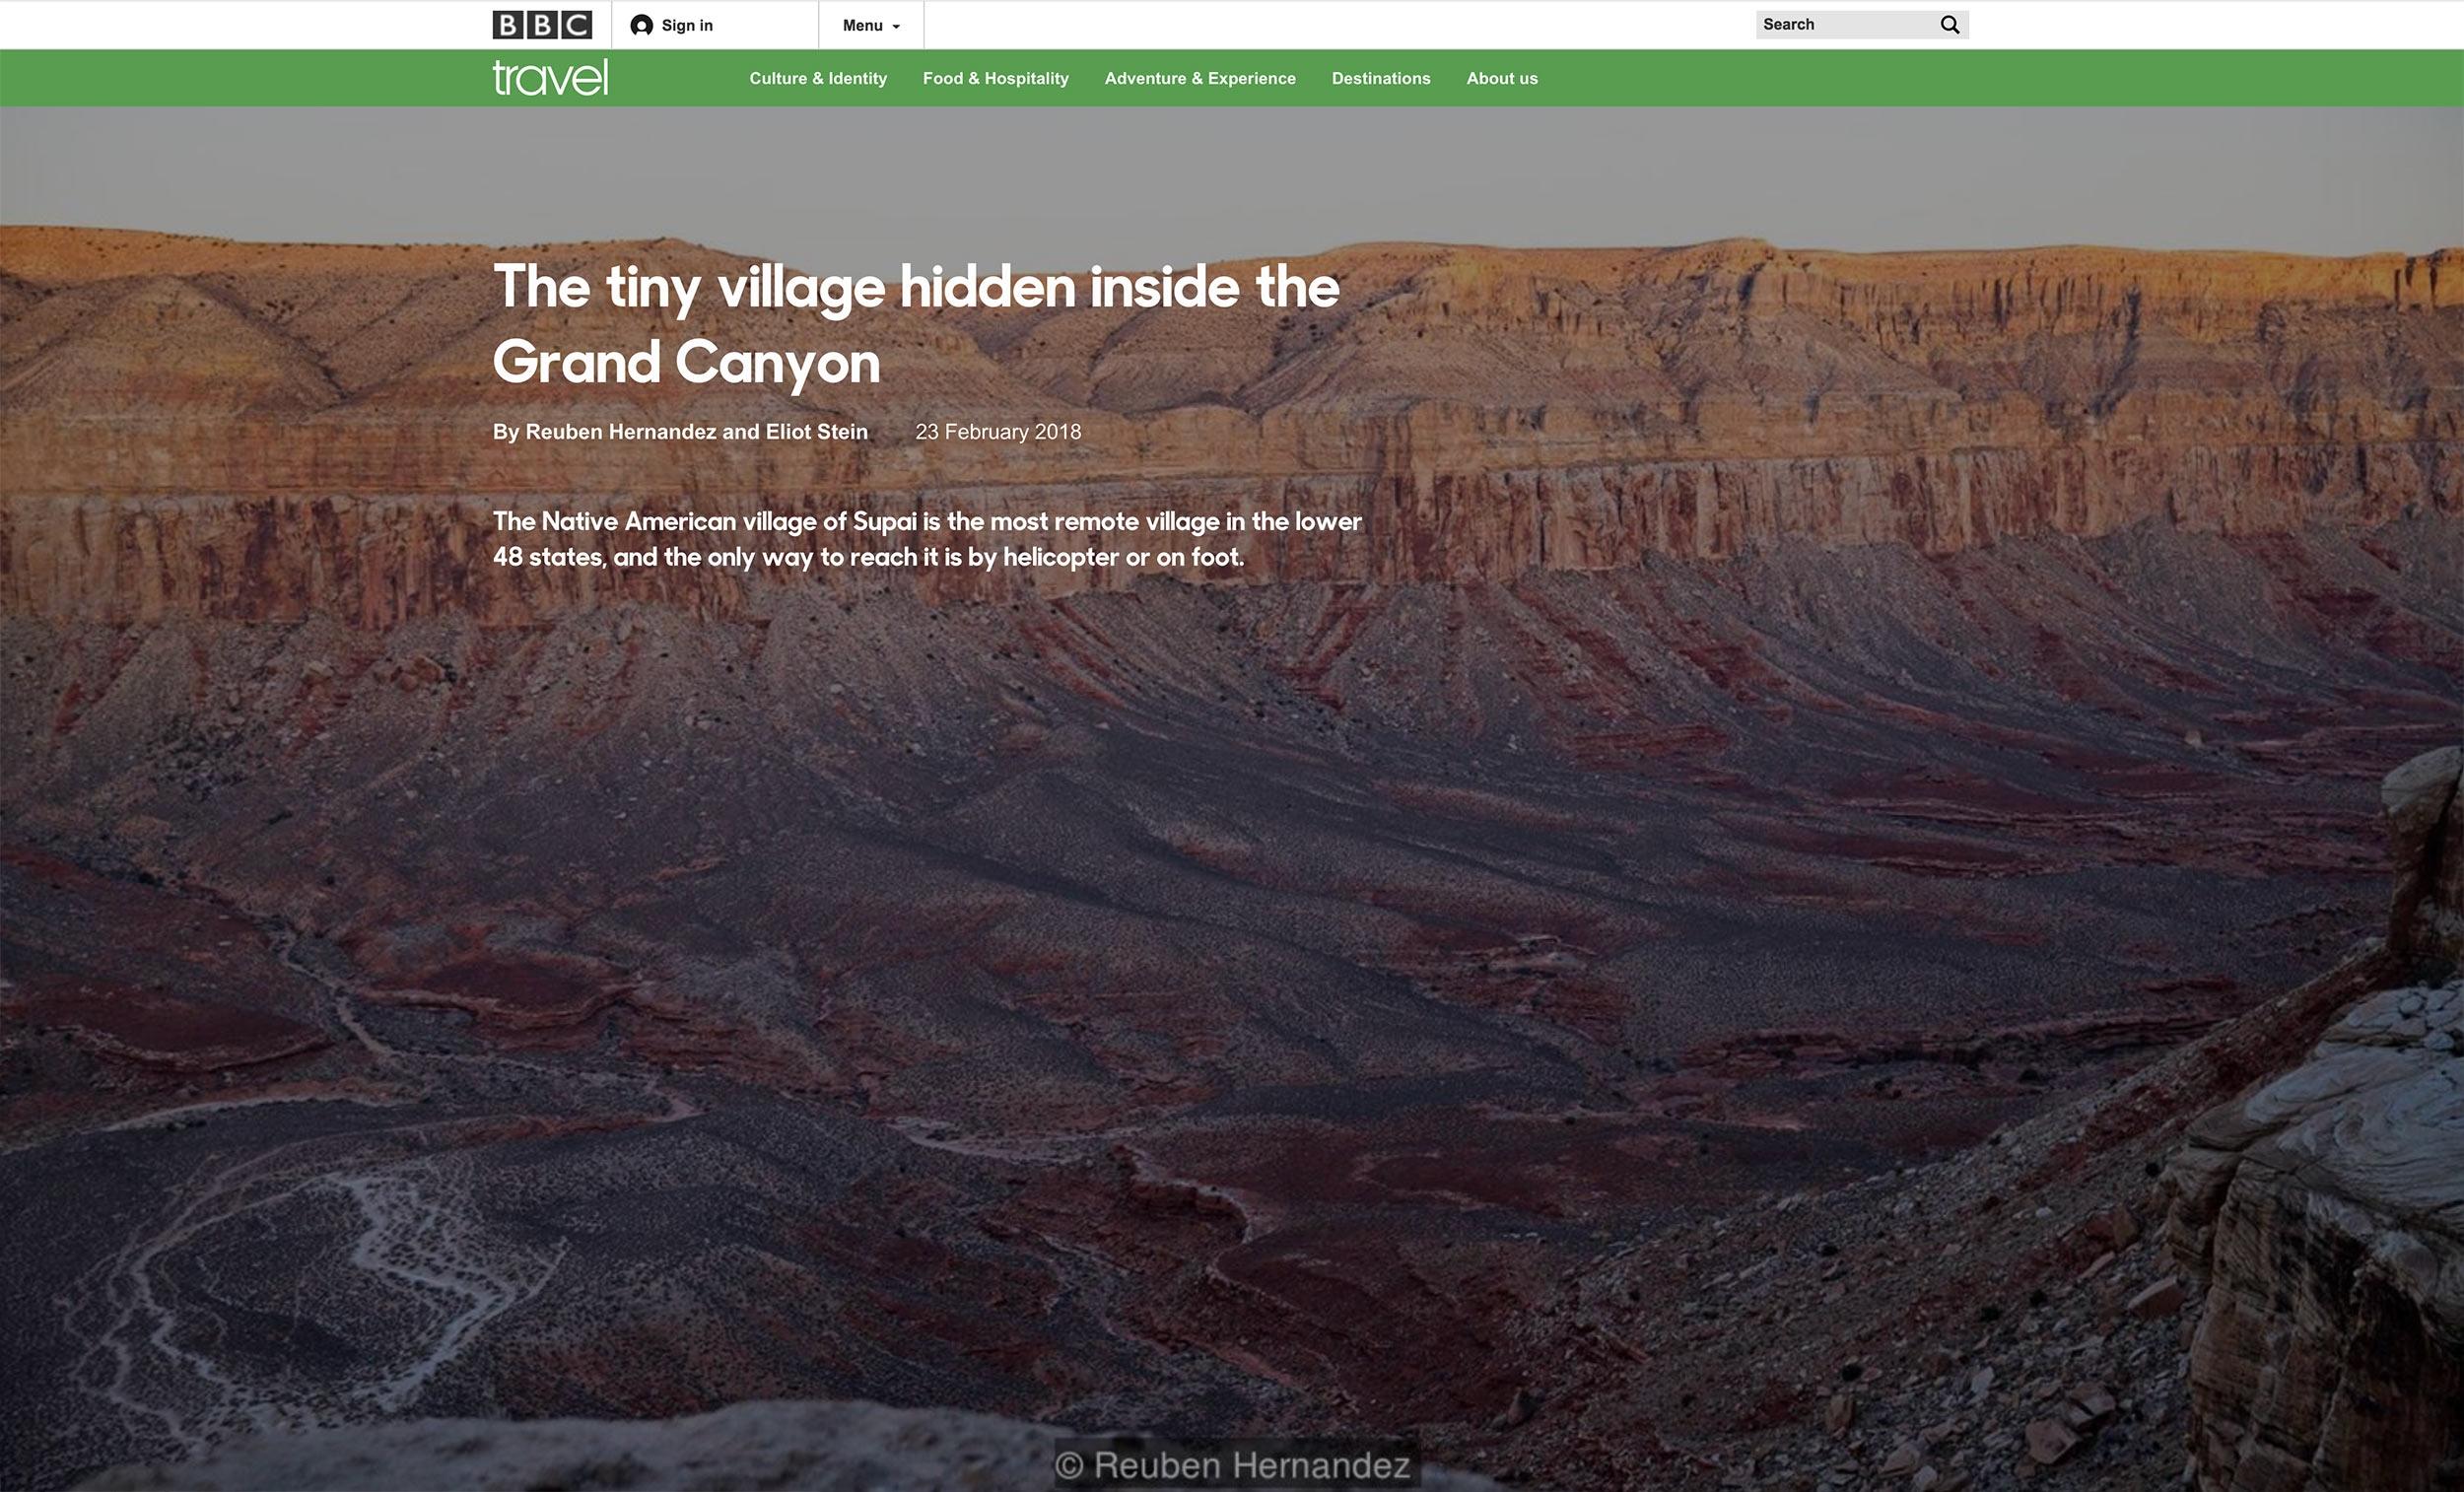 BBC-Travel-Web.jpg